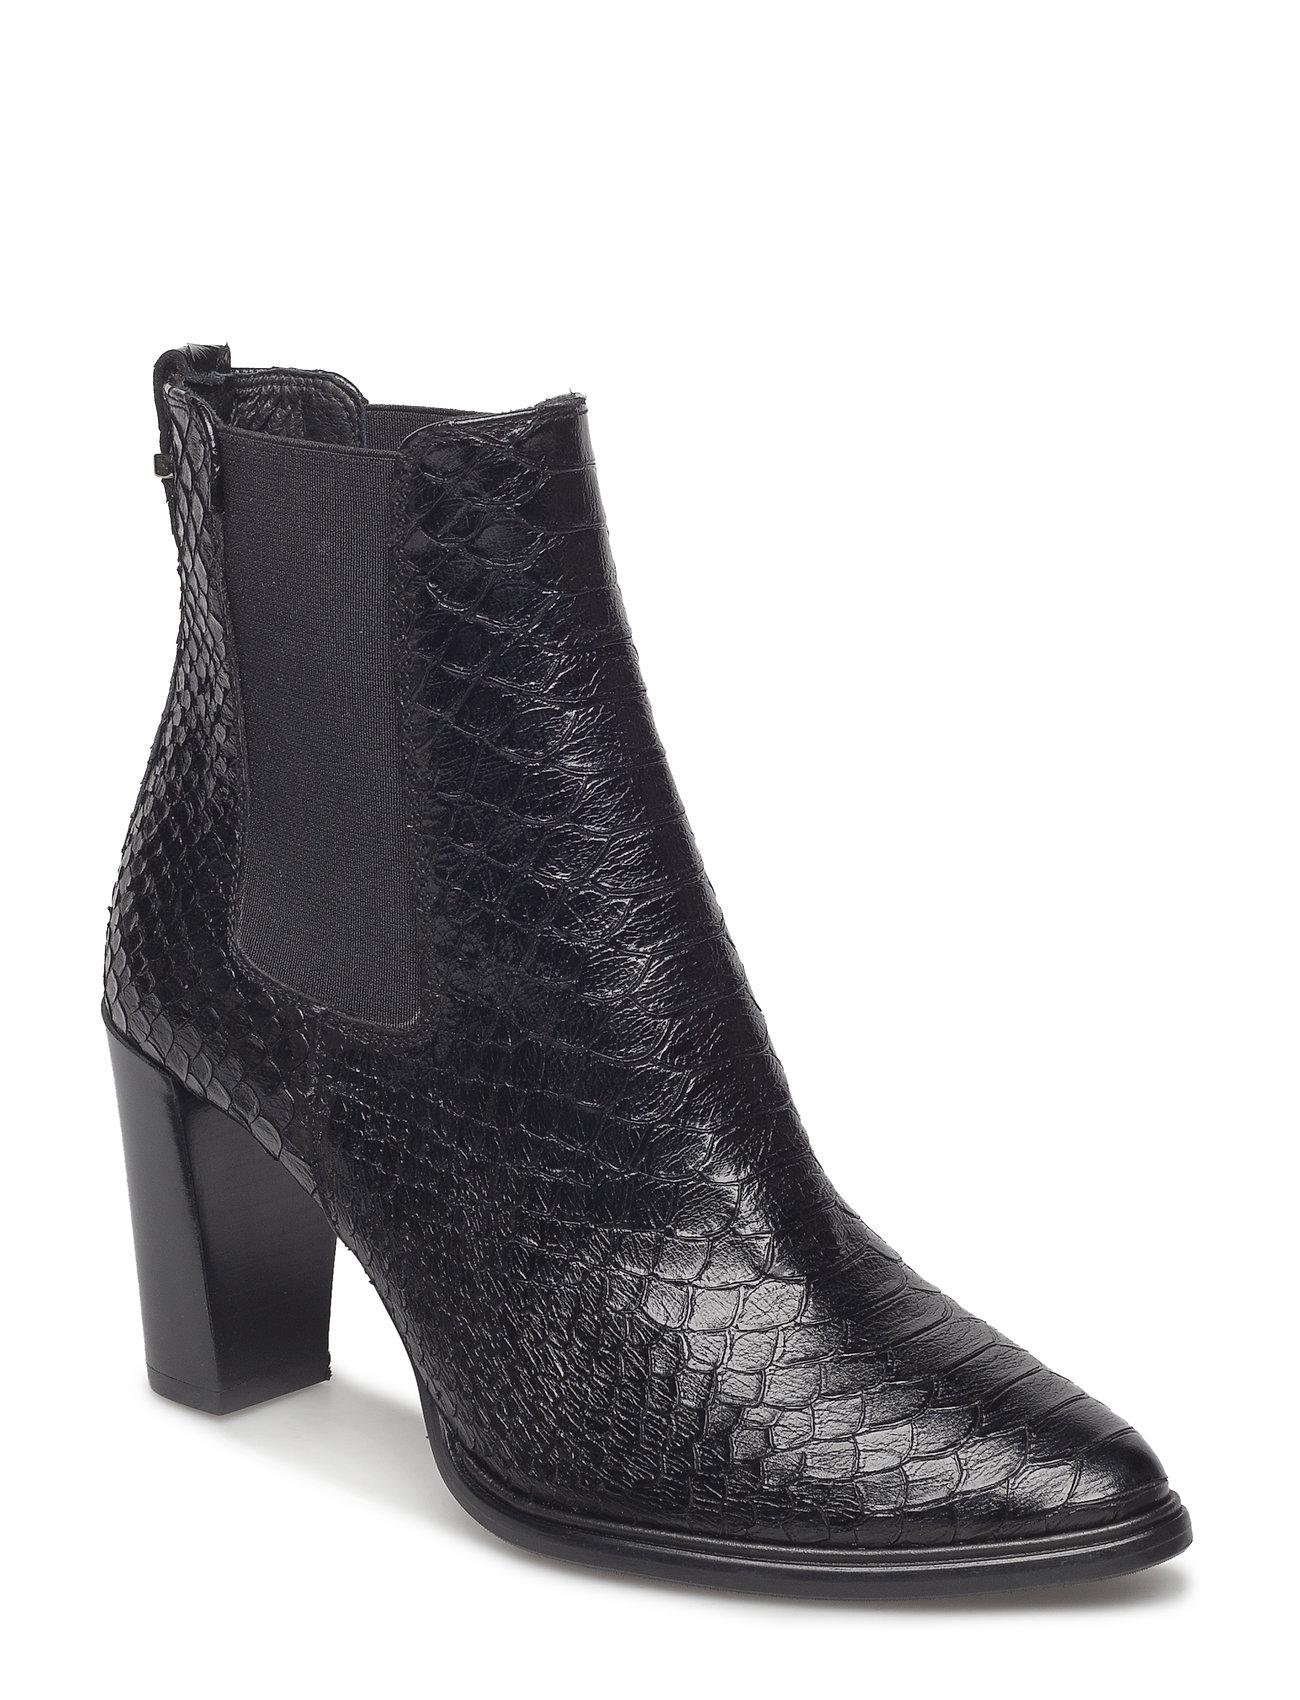 Billi Bi Boots 7792 - BLACK POLO TENERIFE 300